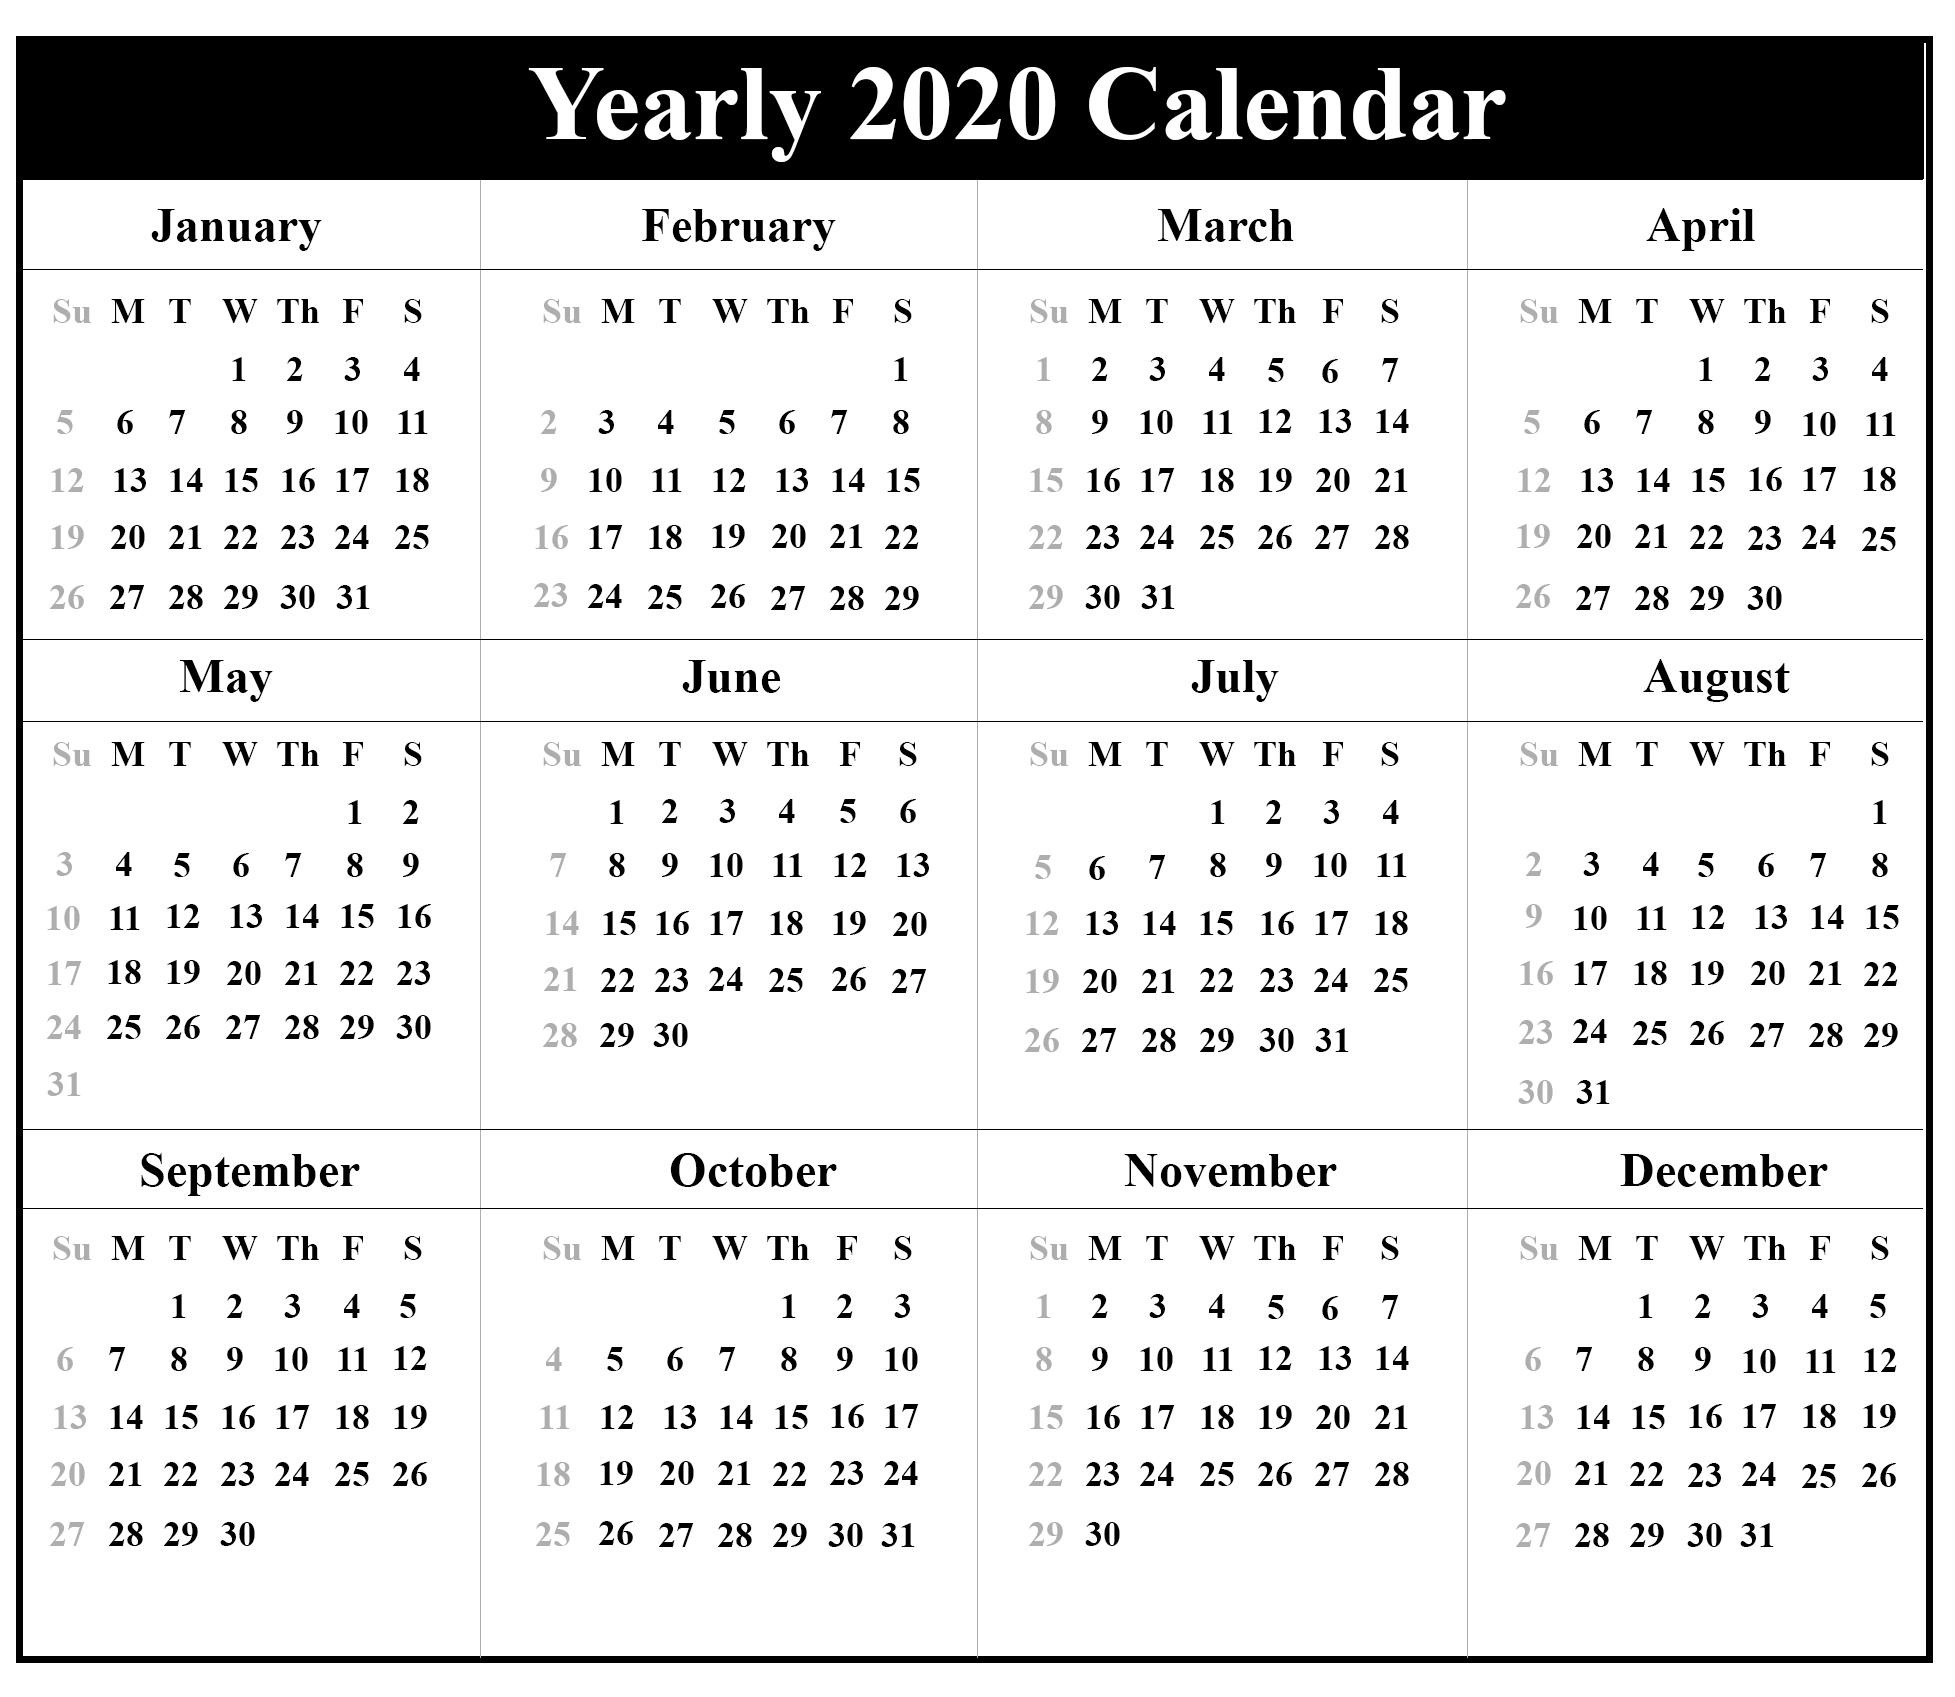 Printable Yearly Calendar 2020 Template With Holidays [Pdf-2020 Islamic Calendar Holidays